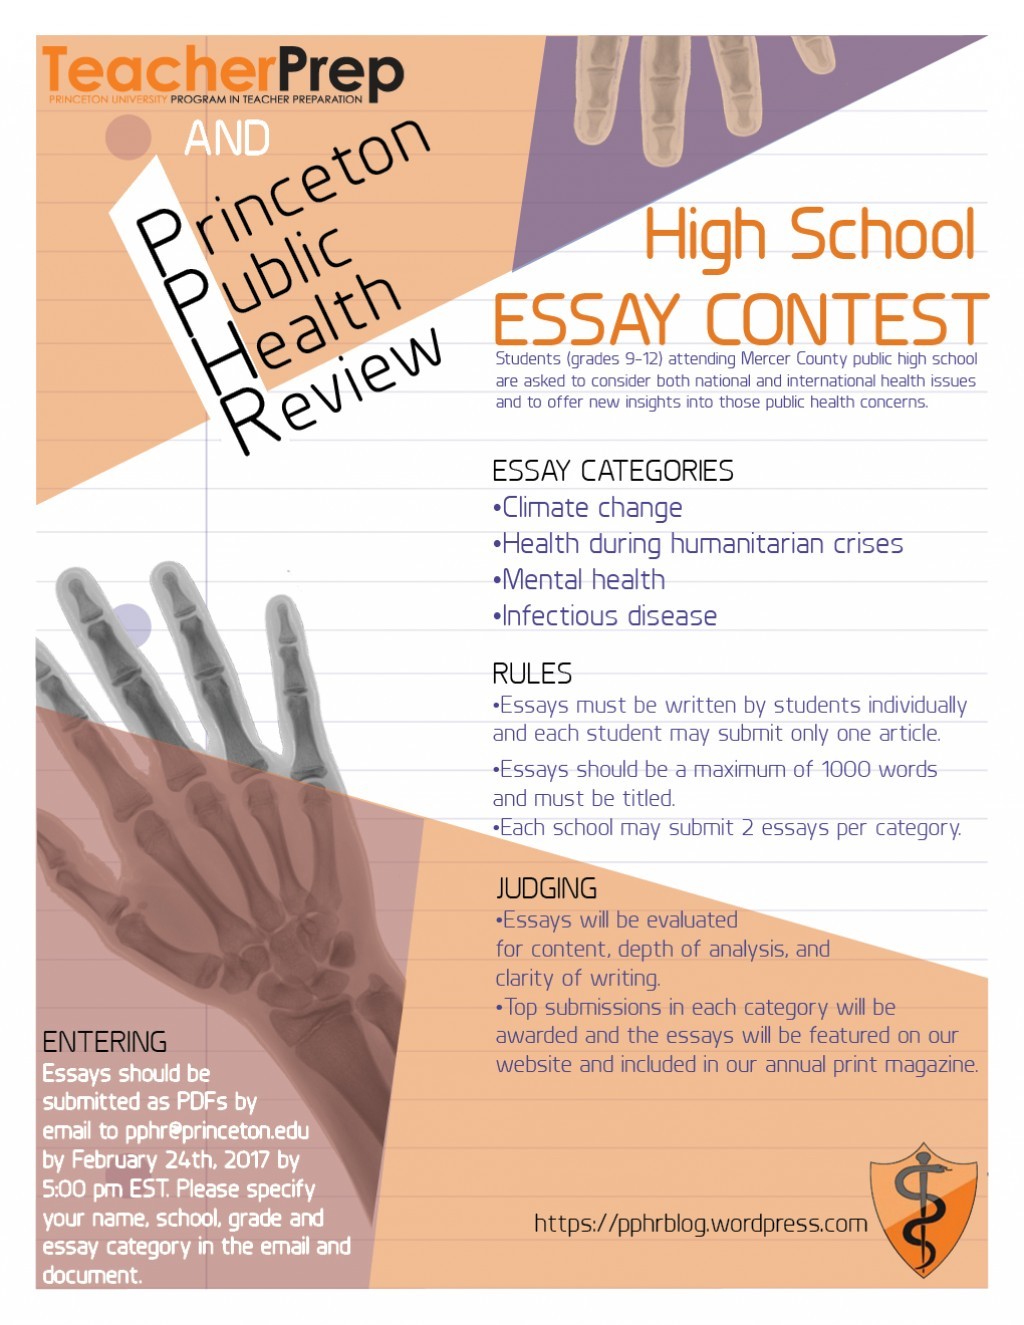 015 Princeton Essay Pphressaycontestfeb24 Astounding Review Essays Examples Large